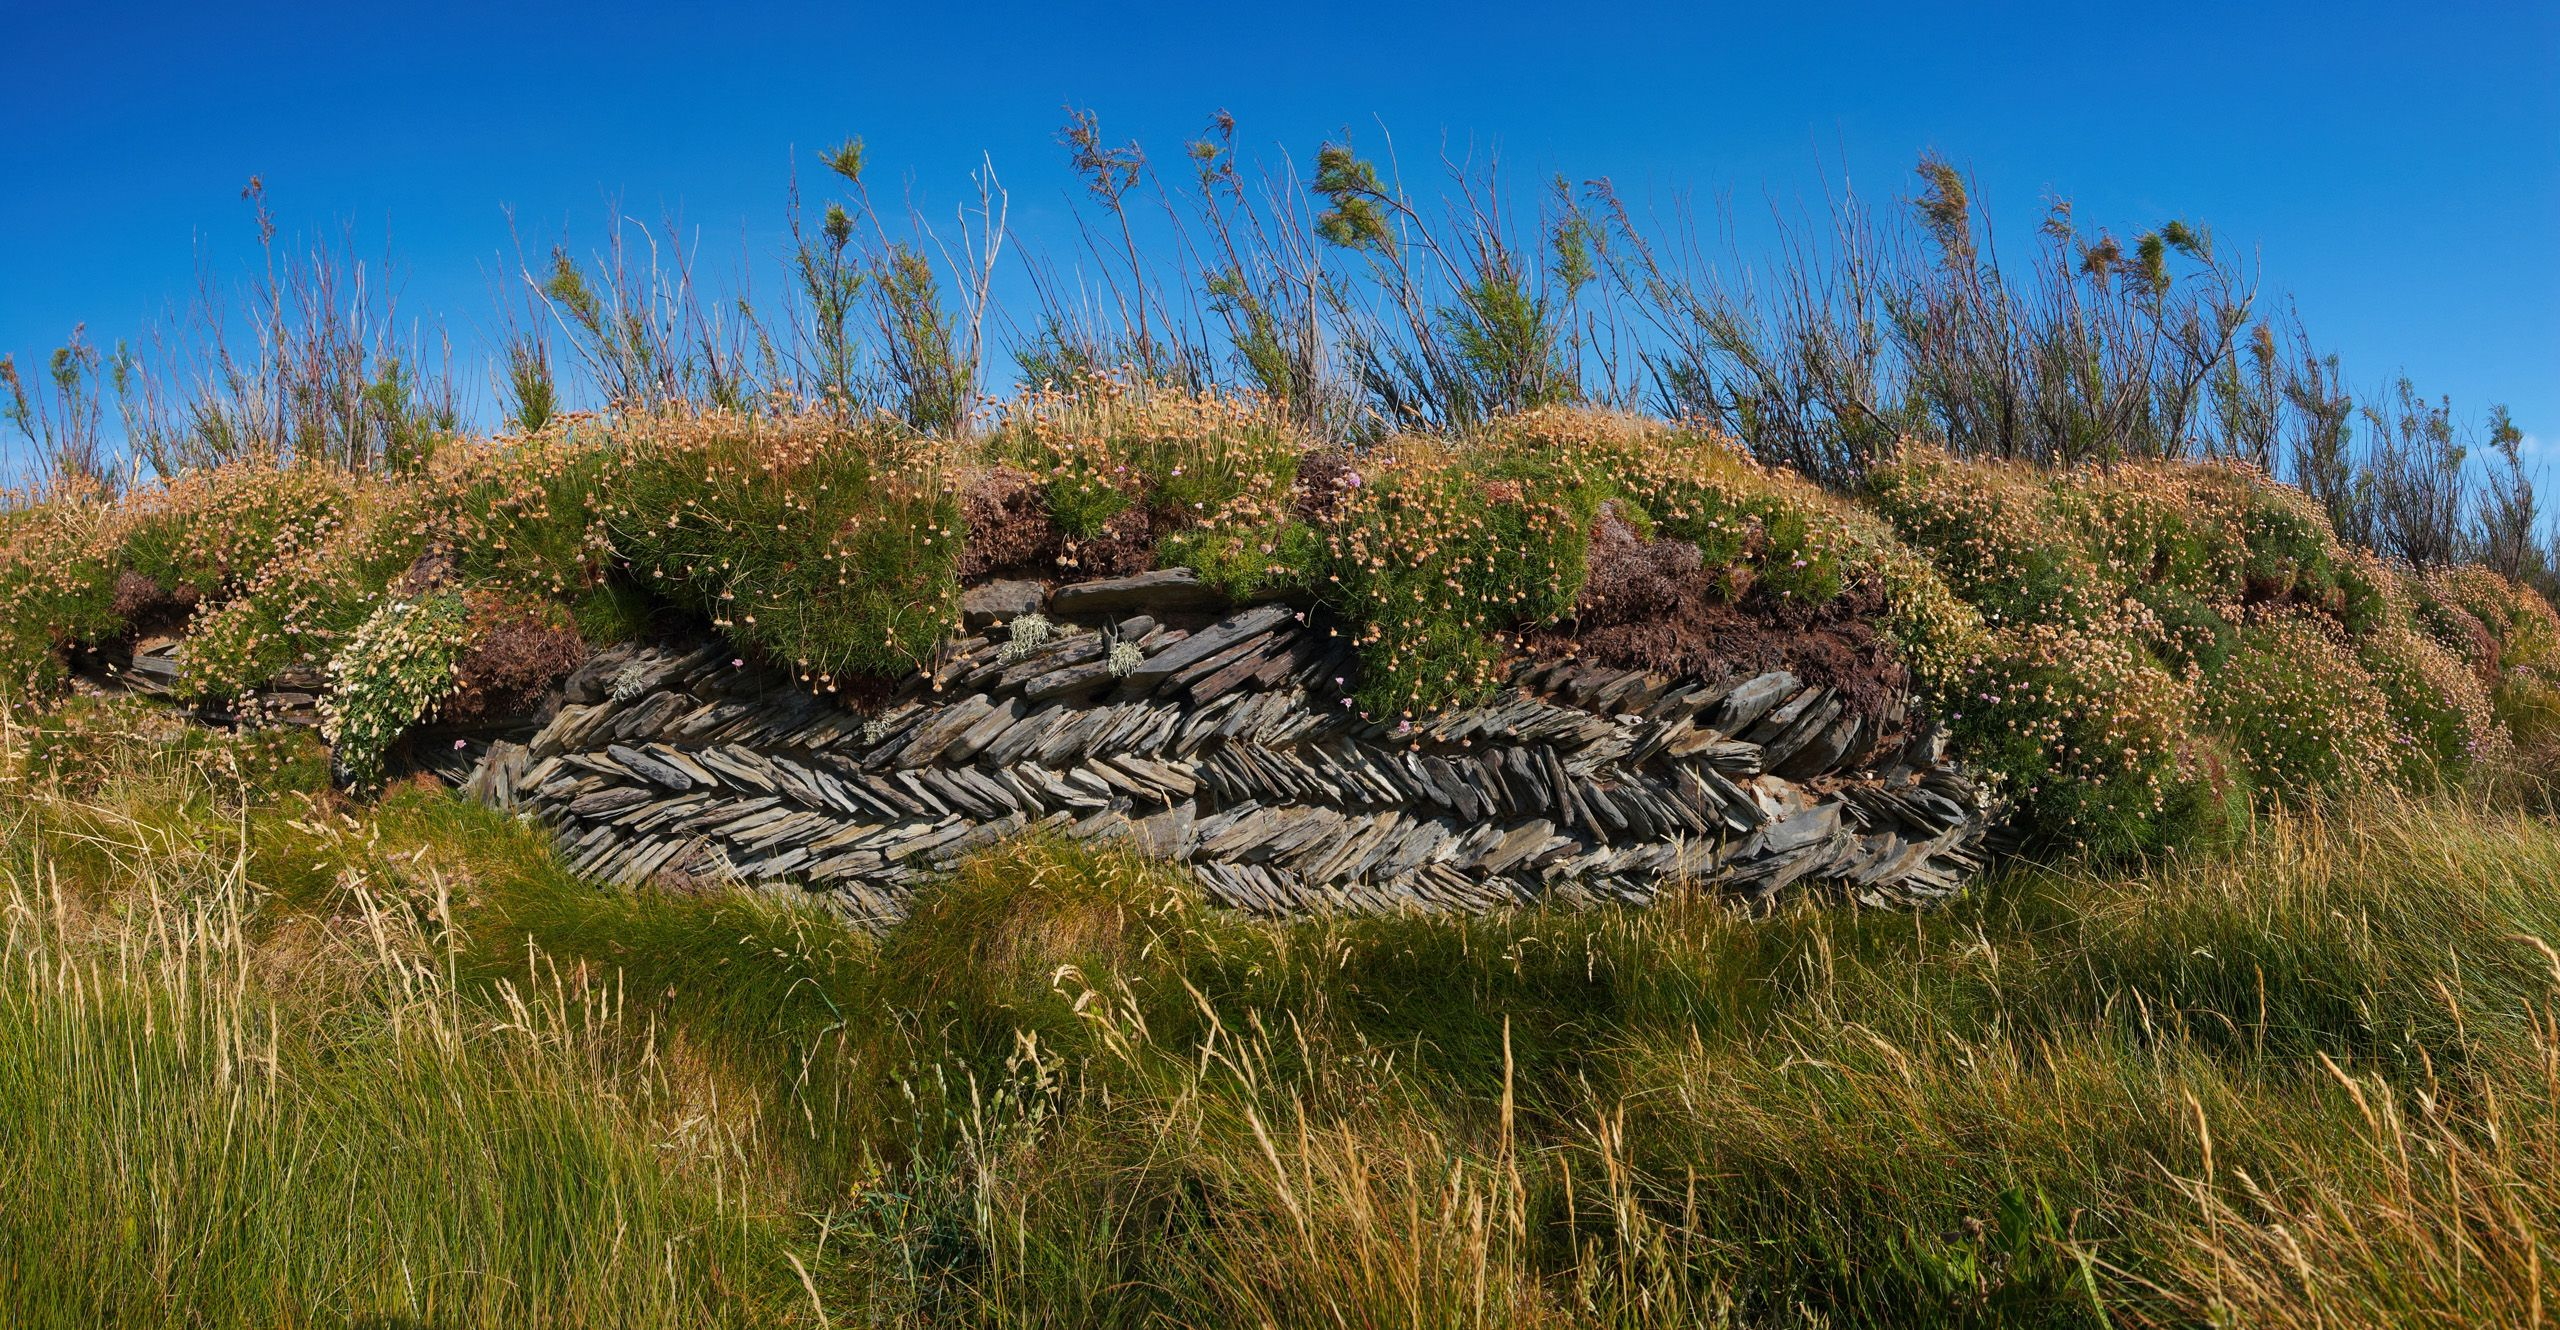 overgrown-wall-pano-4.jpg (2560×1330)